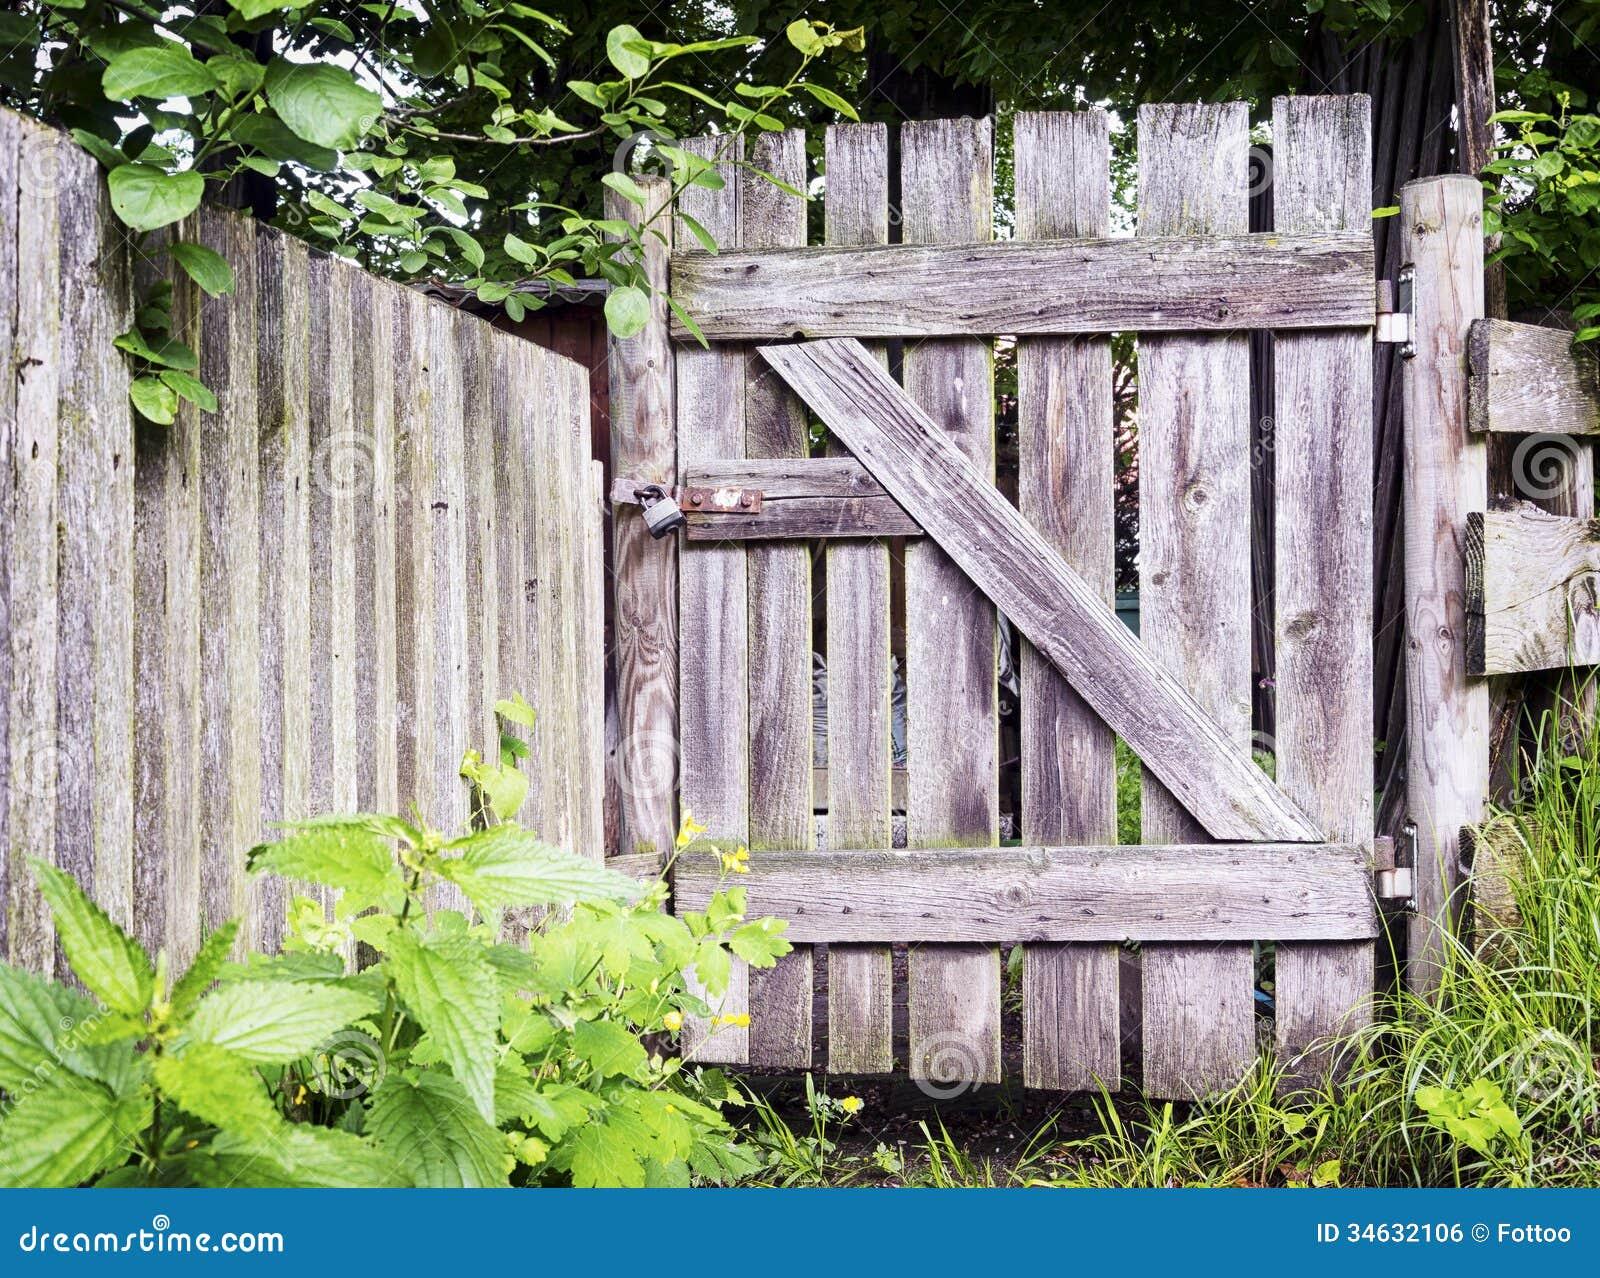 Woden gate royalty free stock image